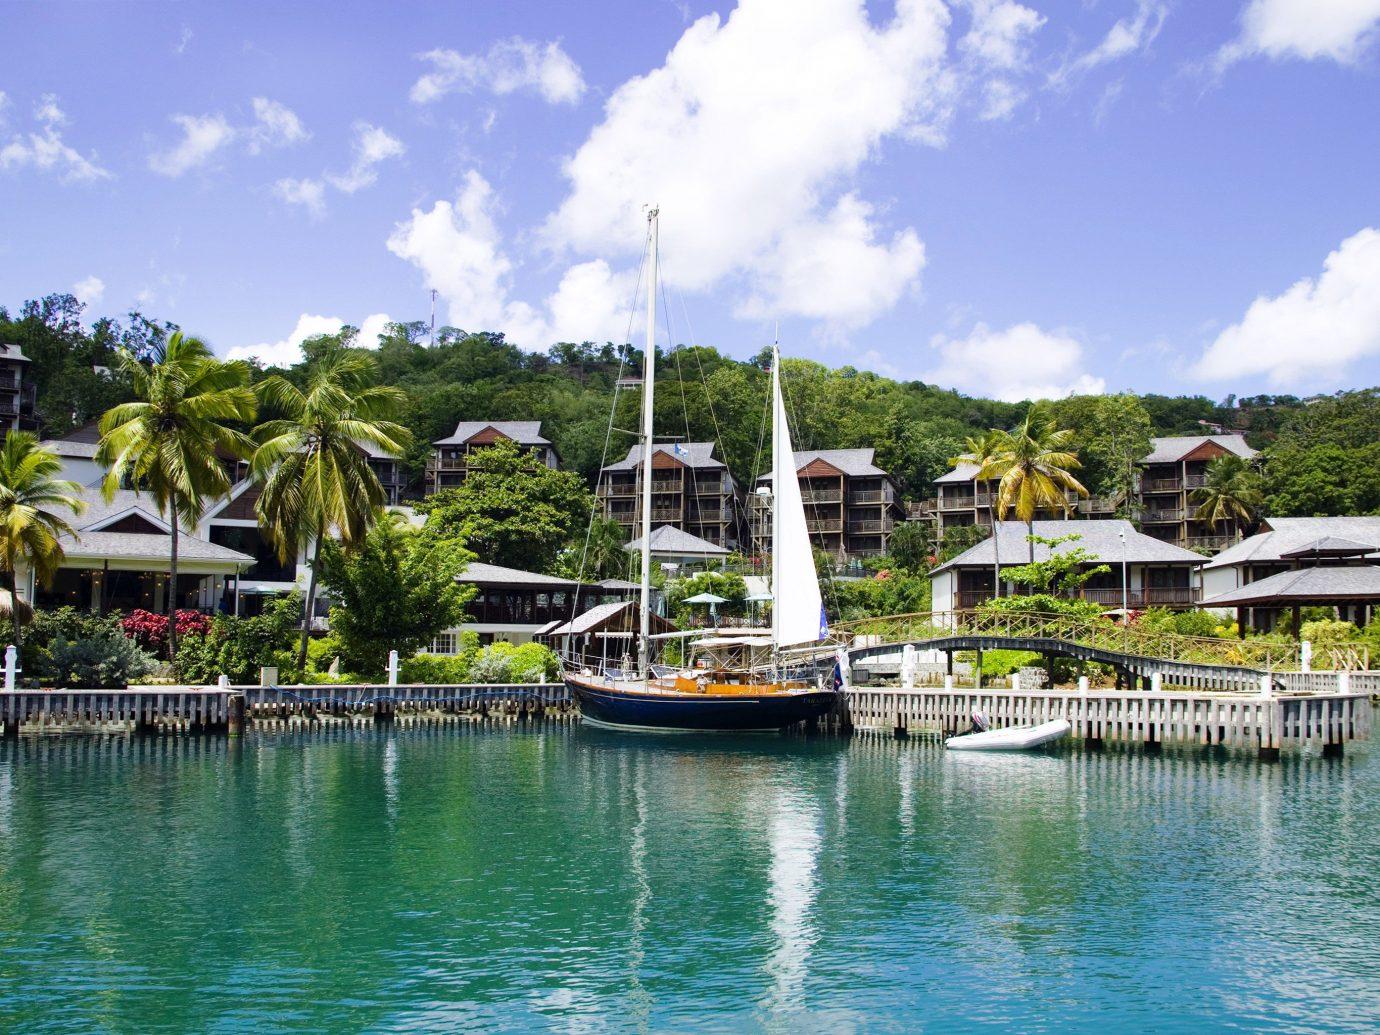 Hotels Luxury Travel sky outdoor water Boat marina scene dock Sea Resort vacation tourism bay Harbor vehicle Lagoon caribbean docked boating Lake Island day